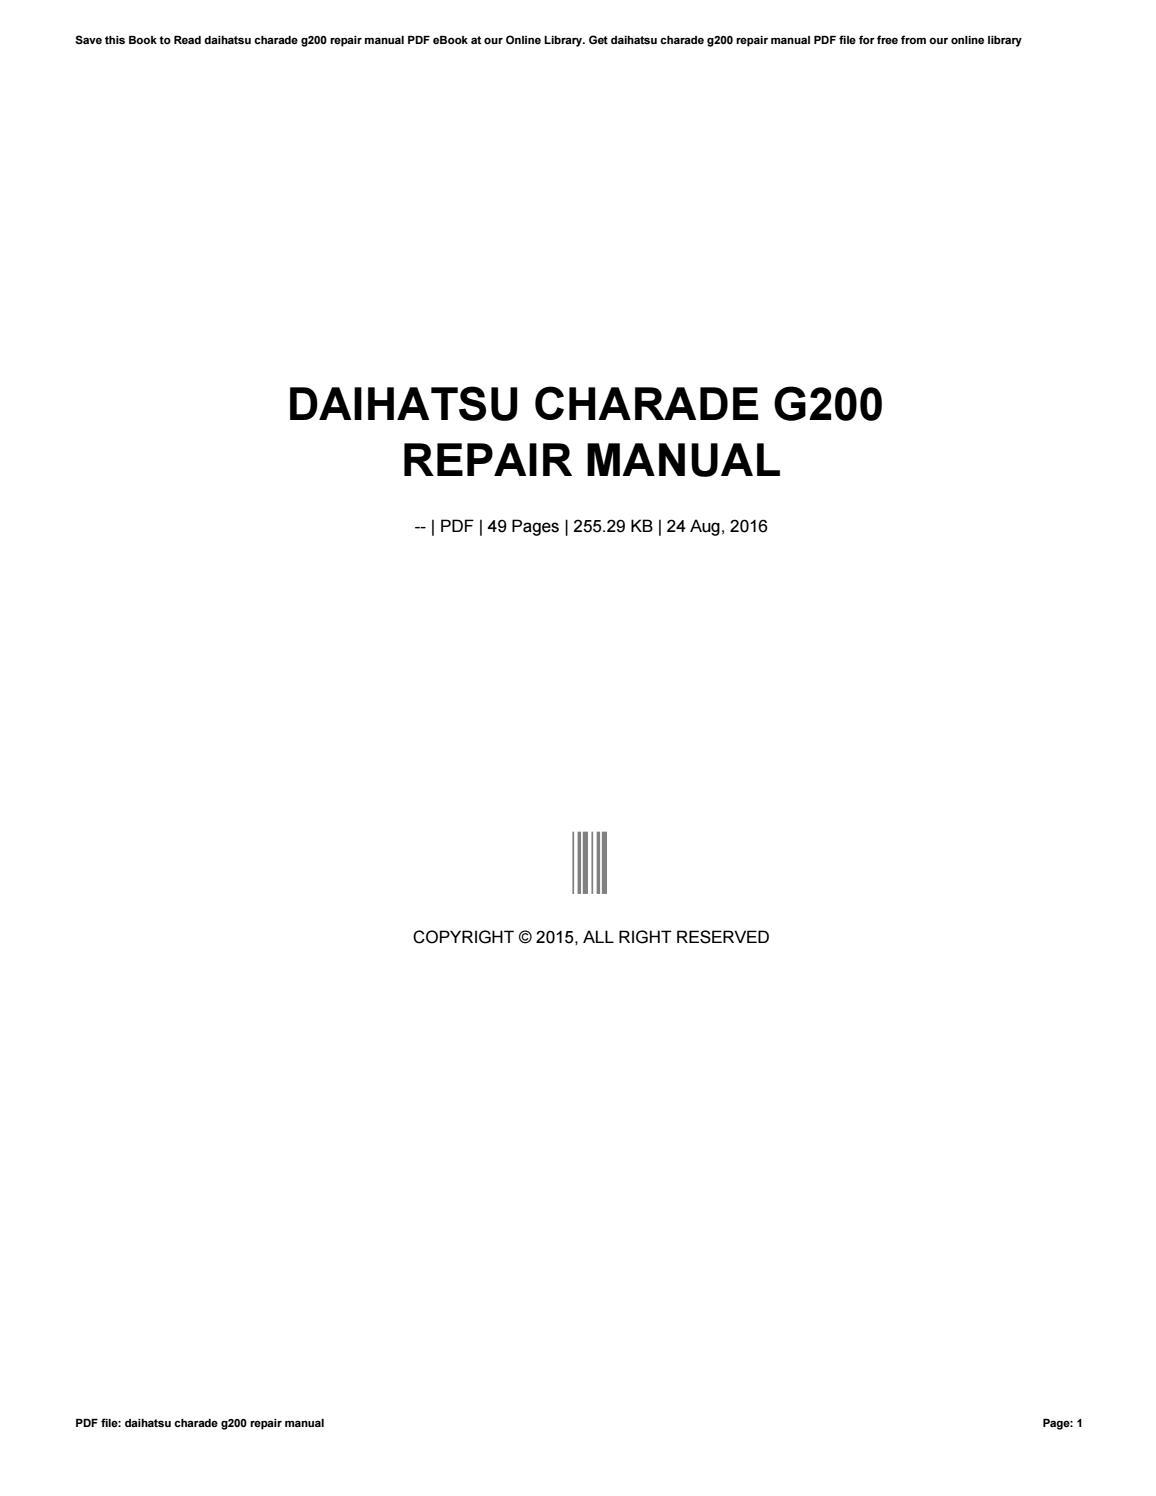 daihatsu charade g200 repair manual by rkomo14 issuu